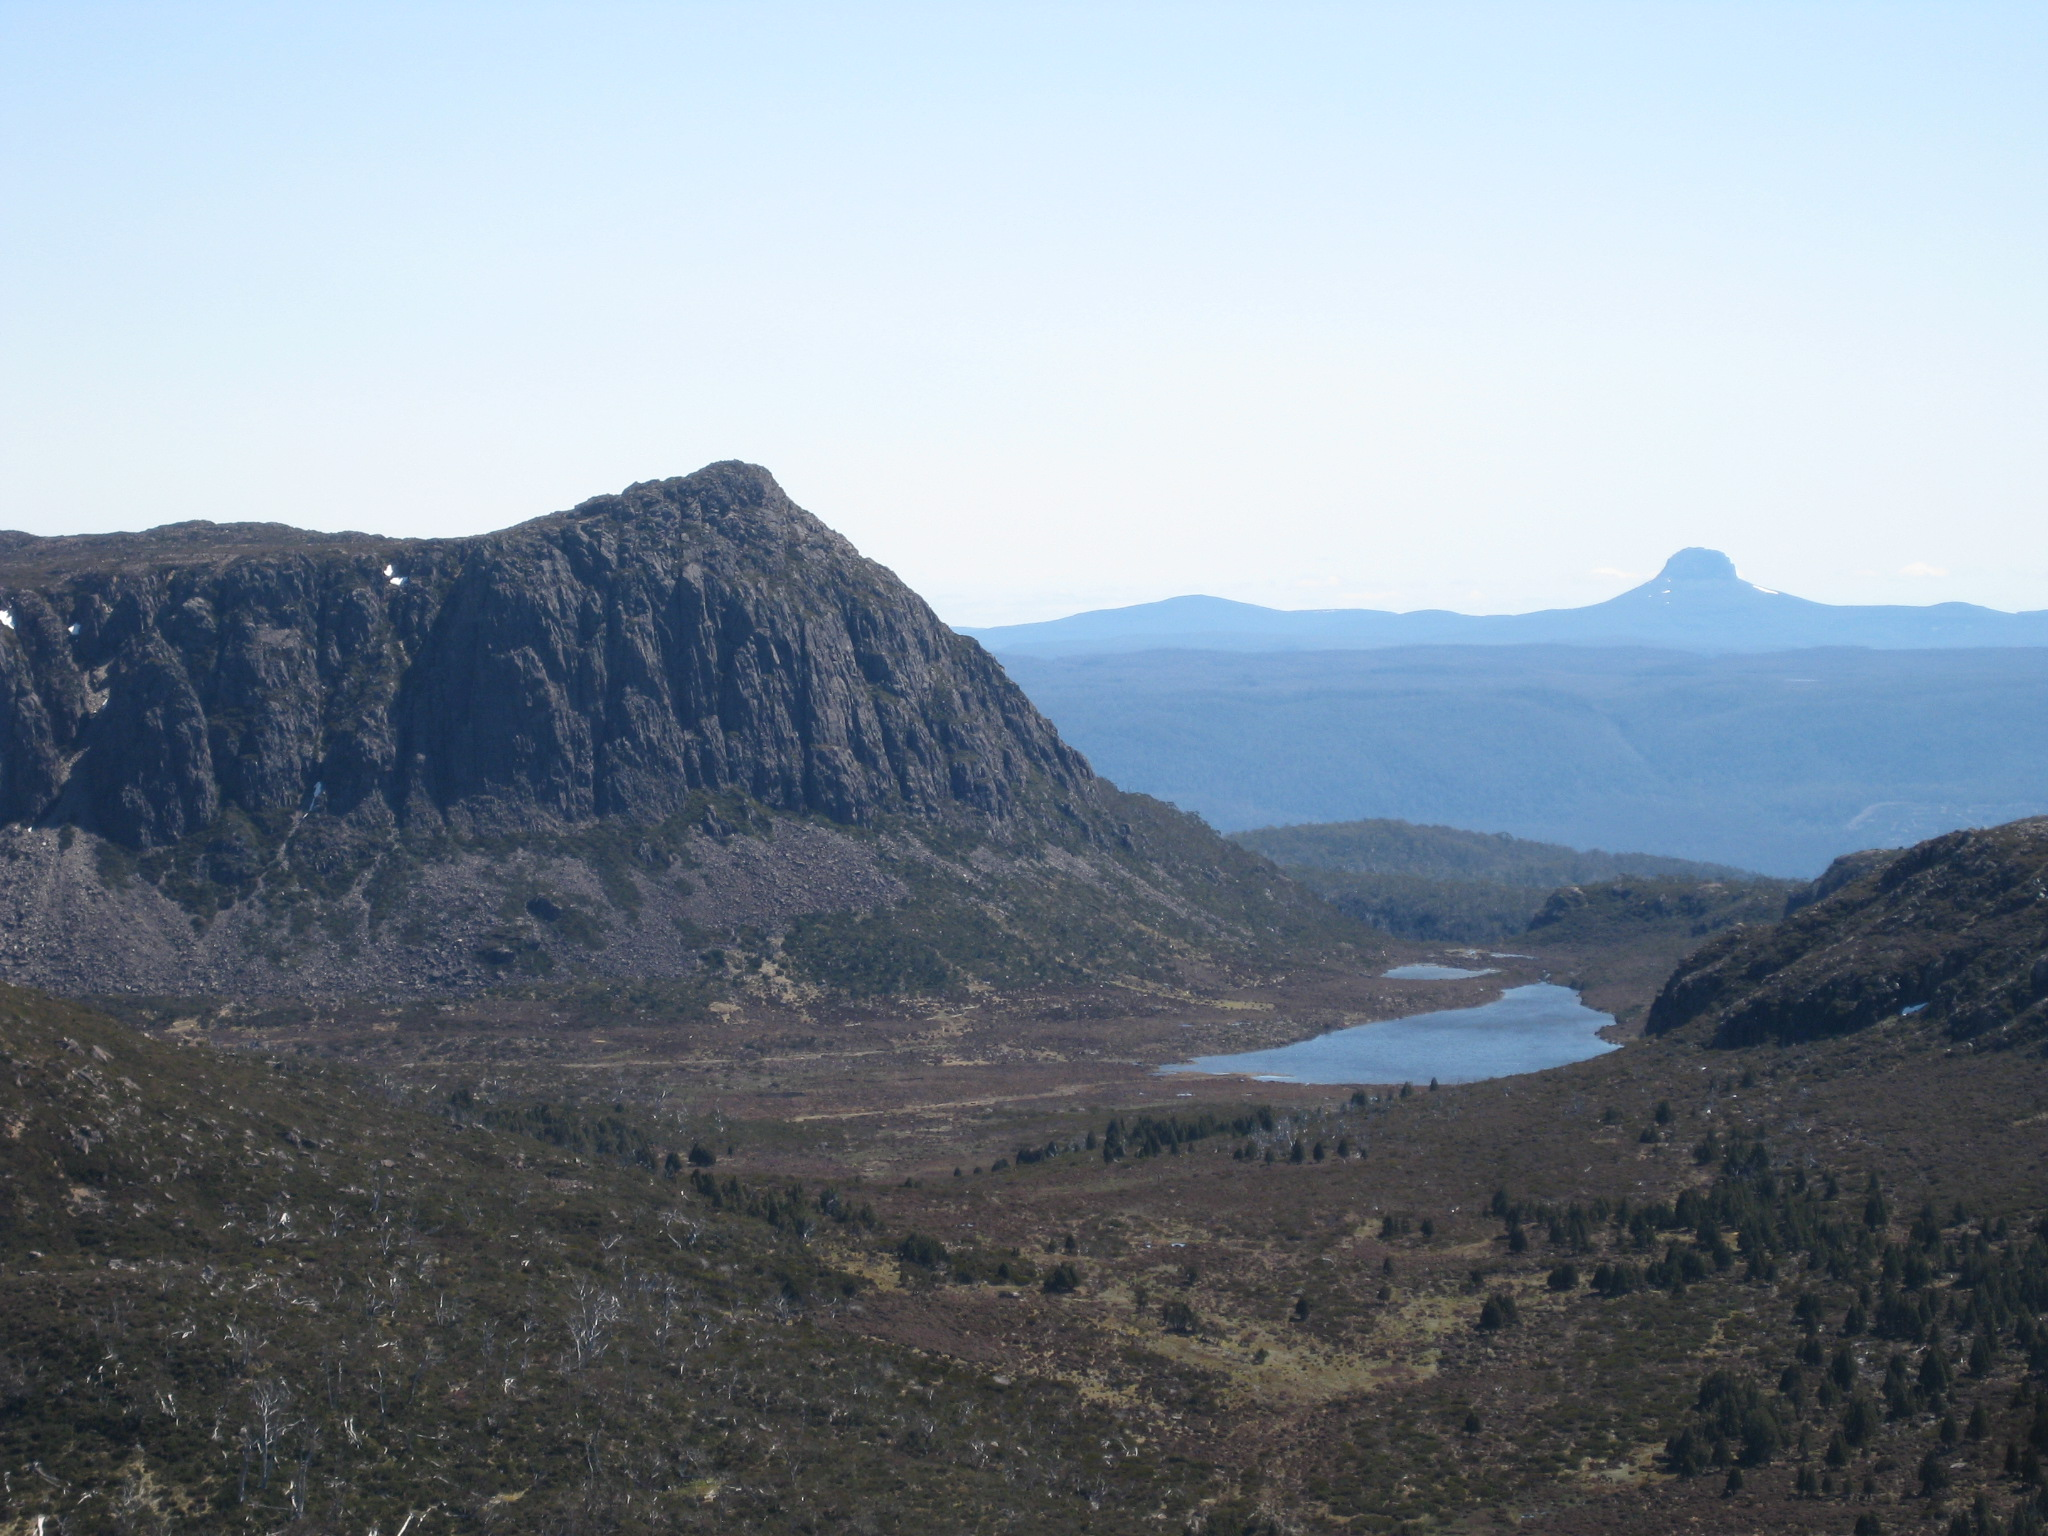 king davids peak and lake Salome from mount jerusalem